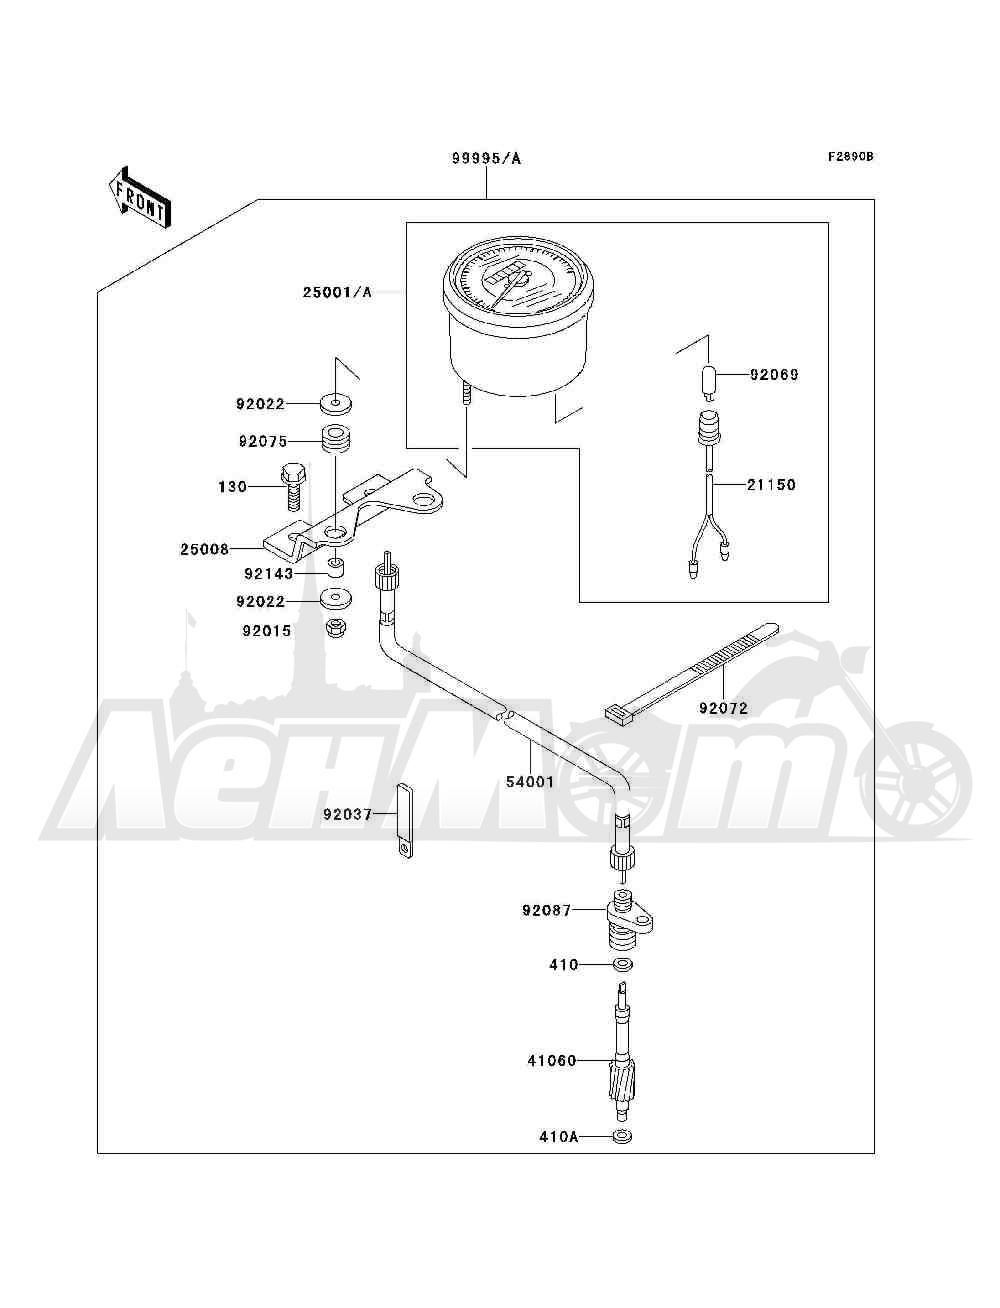 Запчасти для Квадроцикла Kawasaki 1993 BAYOU 300 4X4 (KLF300-C5) Раздел: OPTIONAL PARTS(METER)   опционально детали (счетчик)